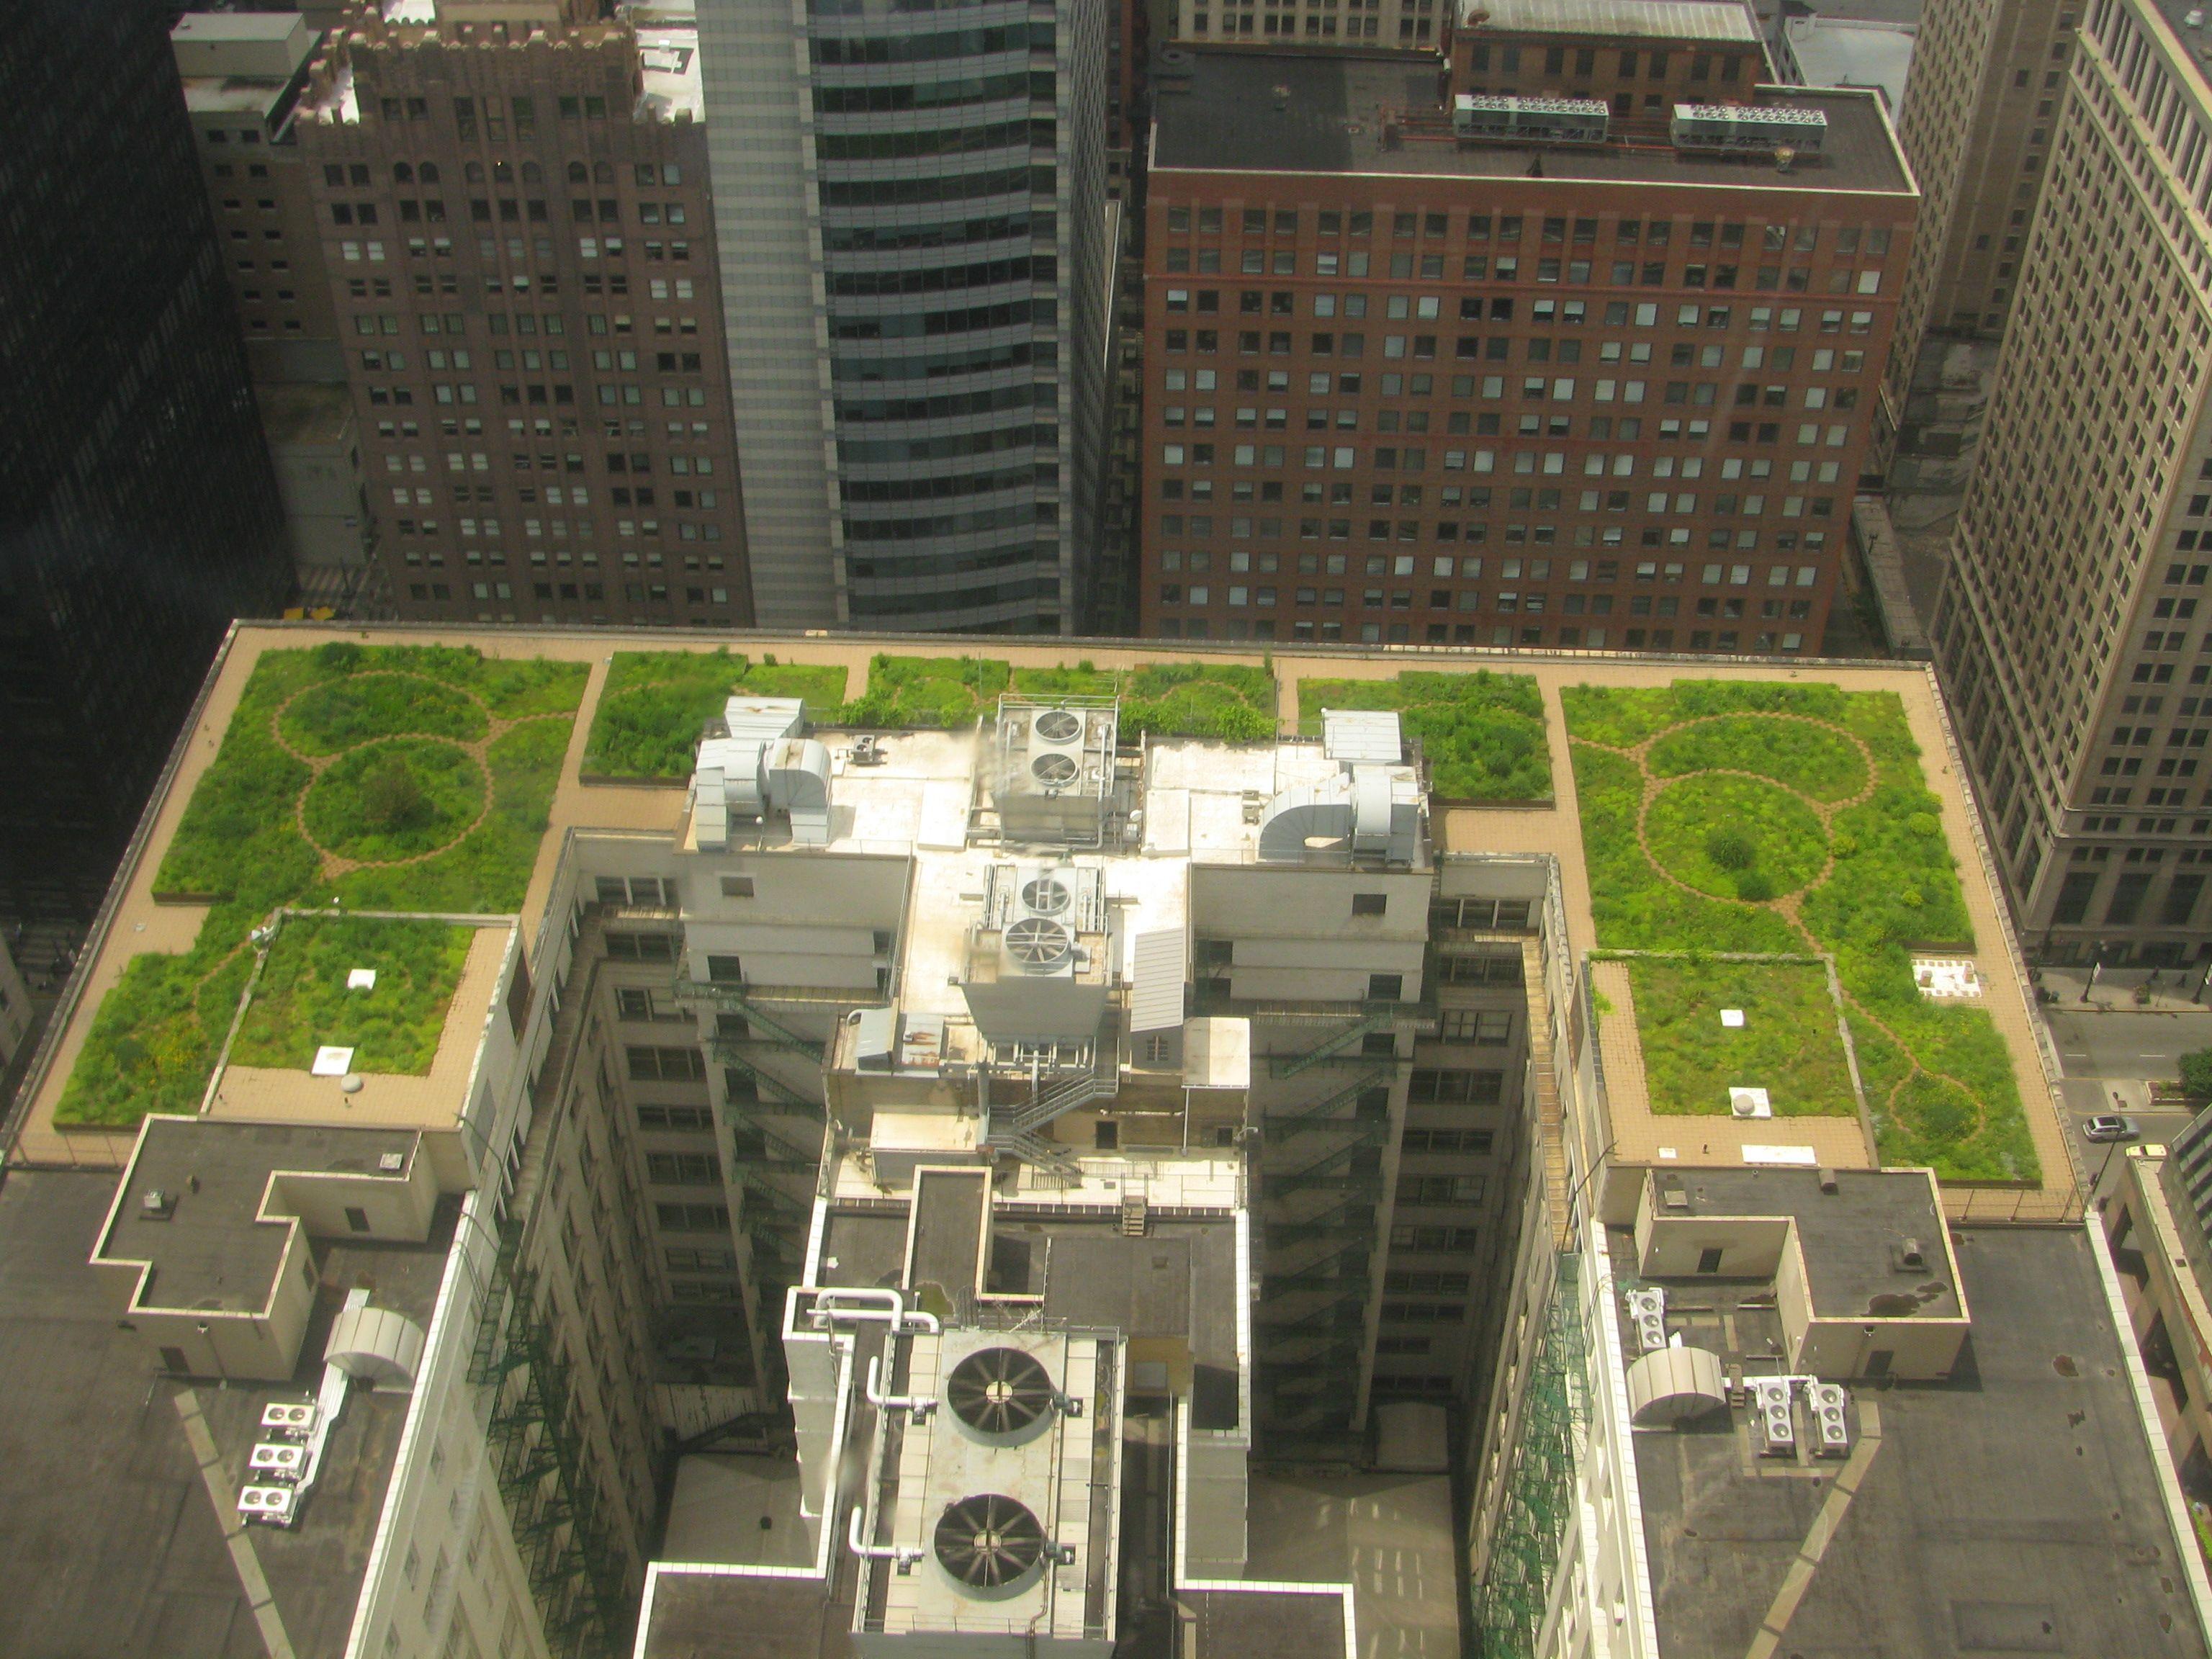 green roof (ახალი სიტყვა დენდროლოგიაში